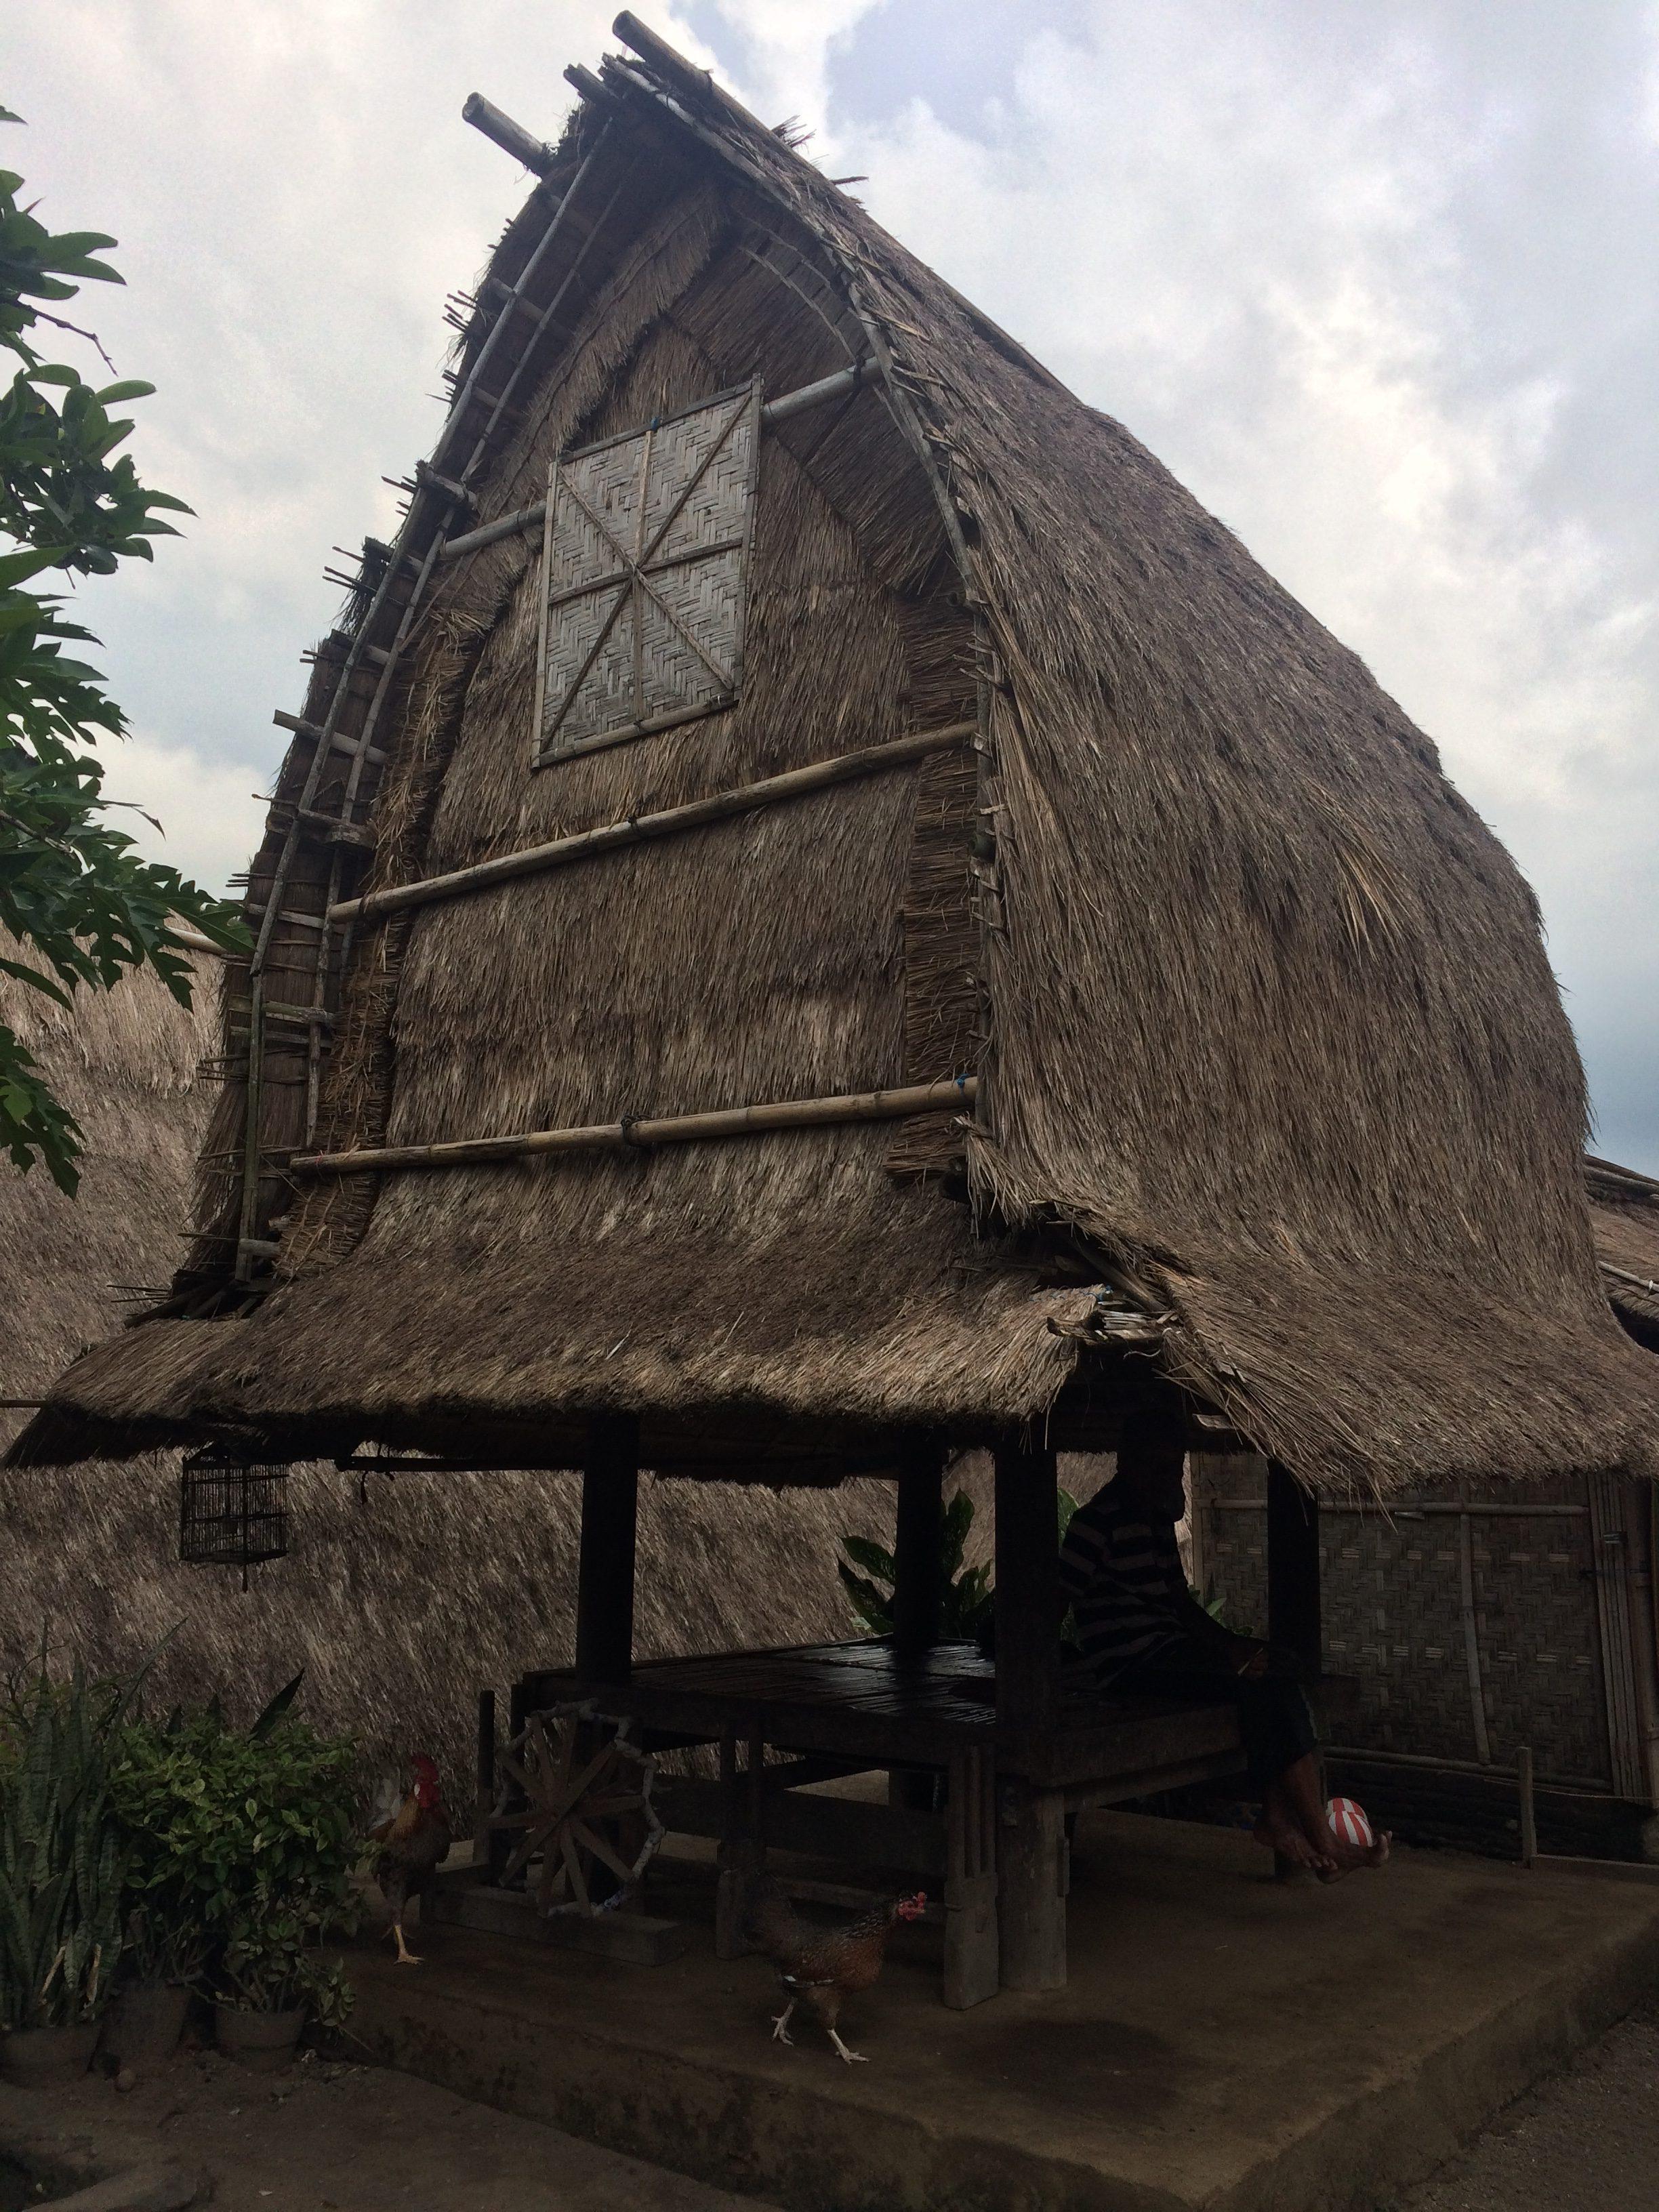 Maison typique sasak, Village de Sade Lombok, Indonésie